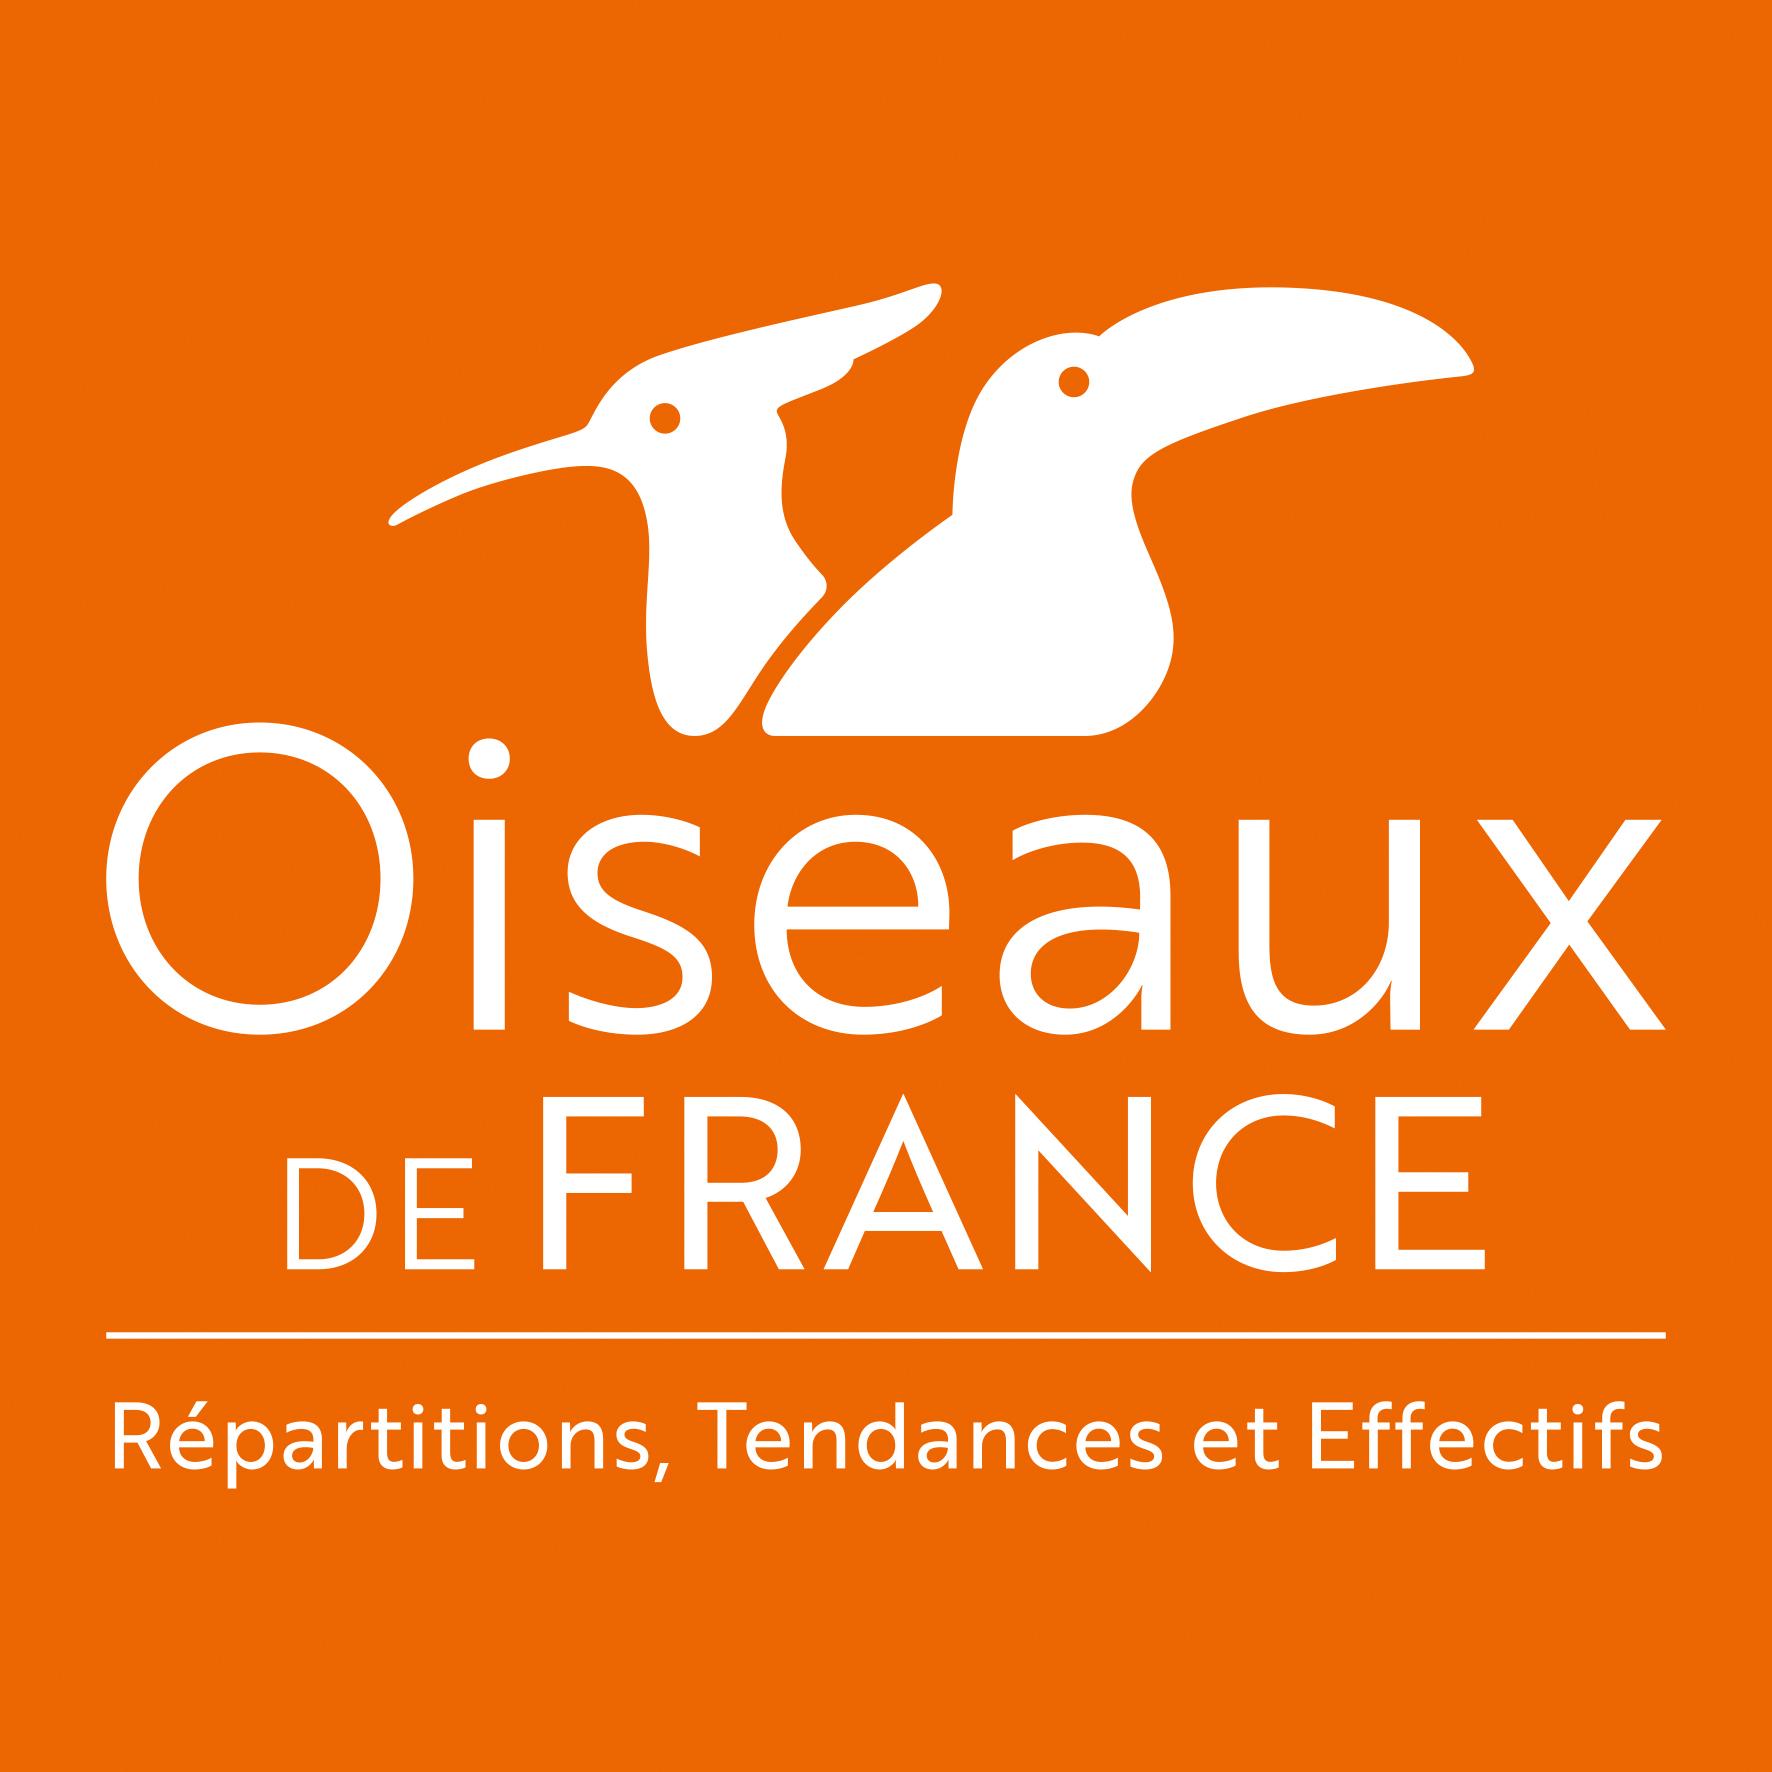 https://cdnfiles1.biolovision.net/www.faune-paca.org/userfiles/MonDossier/OiseauxDeFranceBloc.jpg